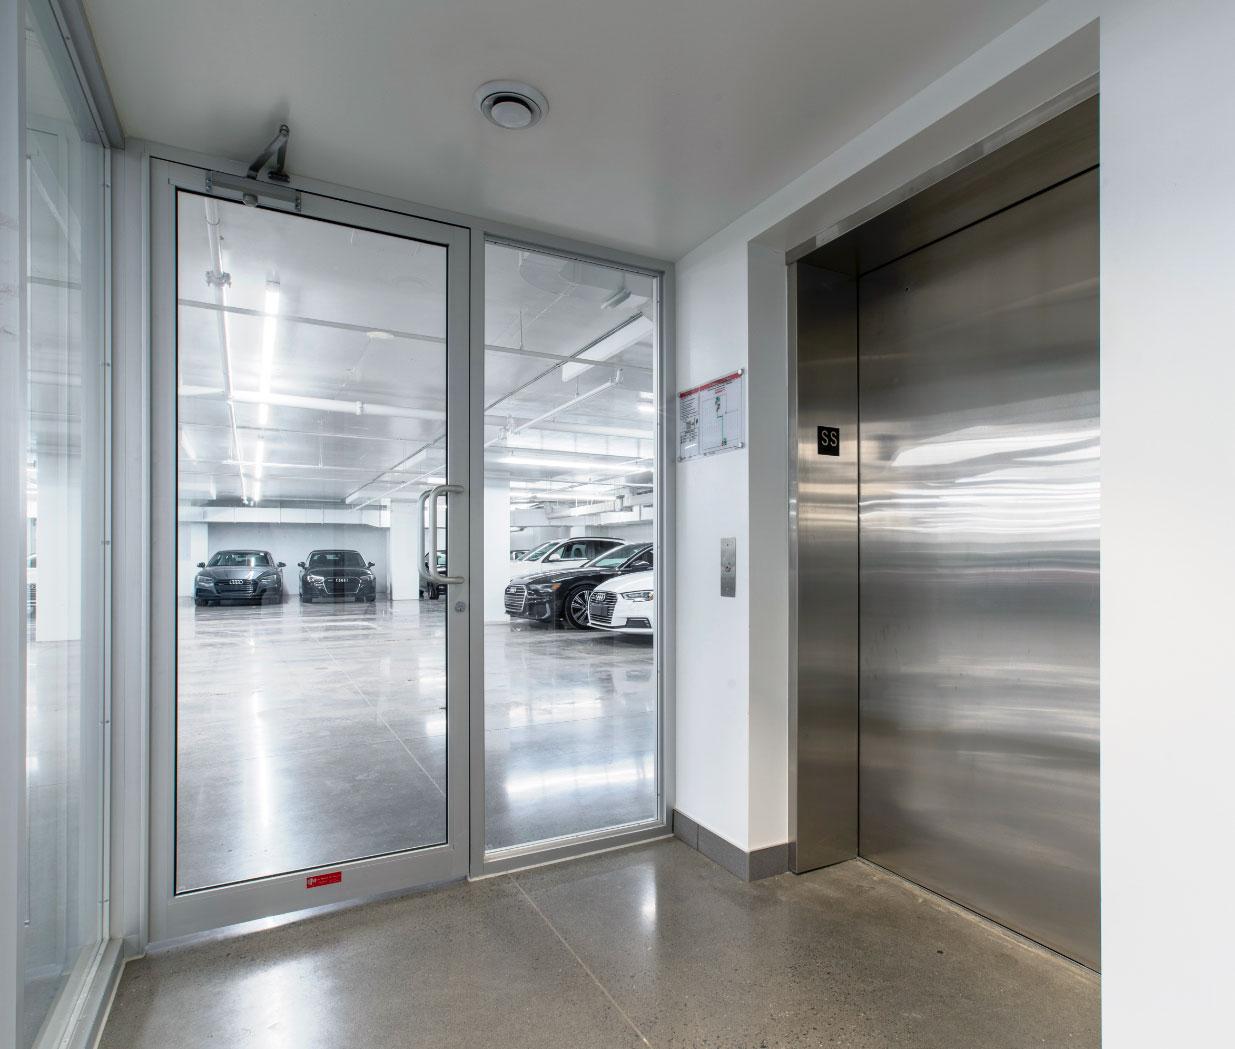 Elevator Sliding Door | Hoistway System | Noddem Technology